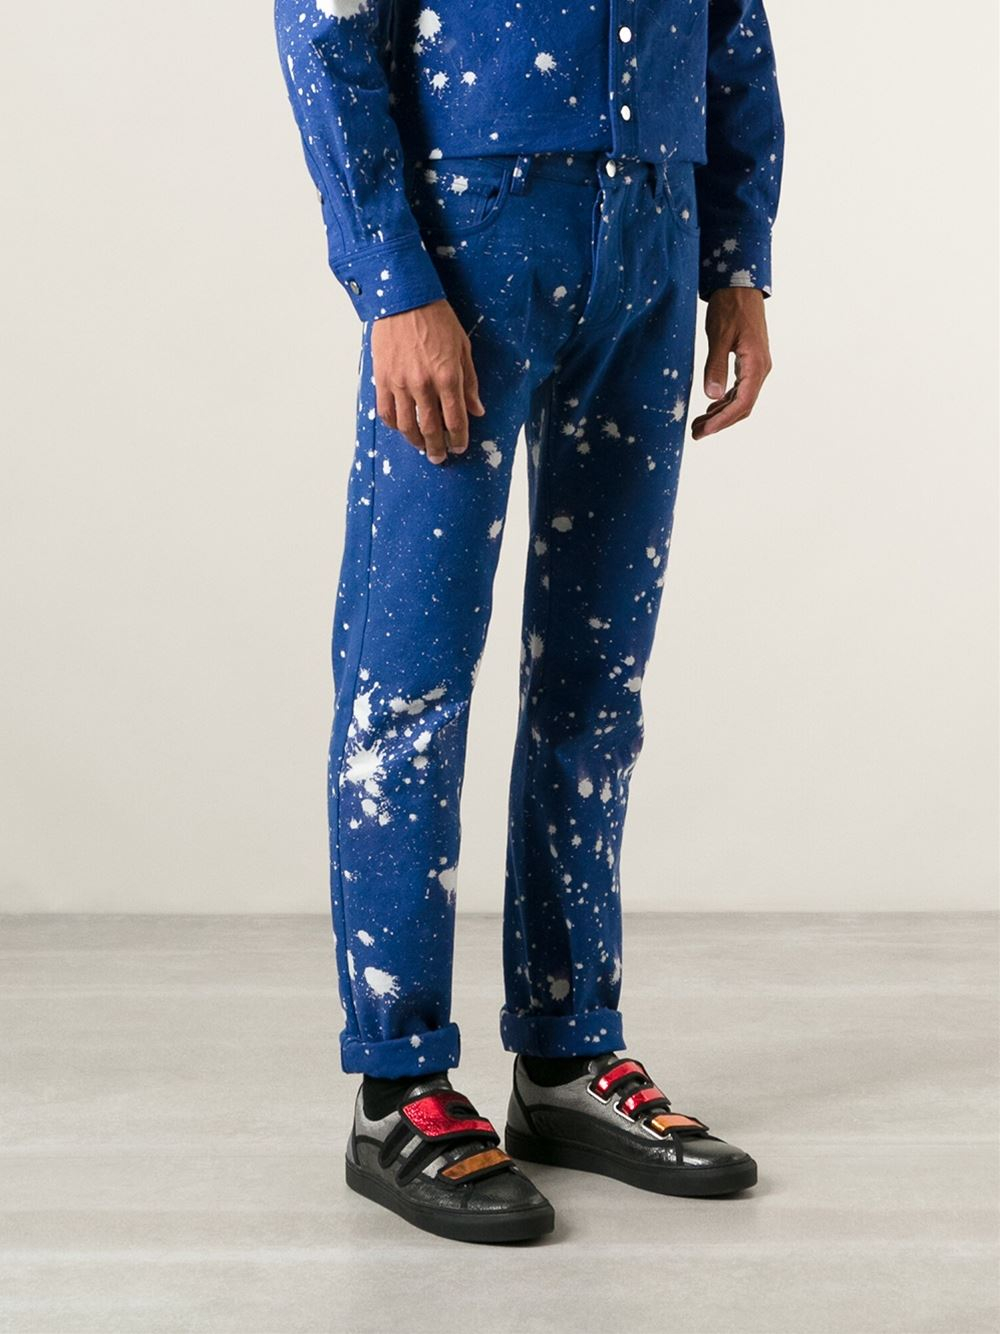 Raf Simons Sterling Ruby Bleached Skinny Jeans in Blue for Men